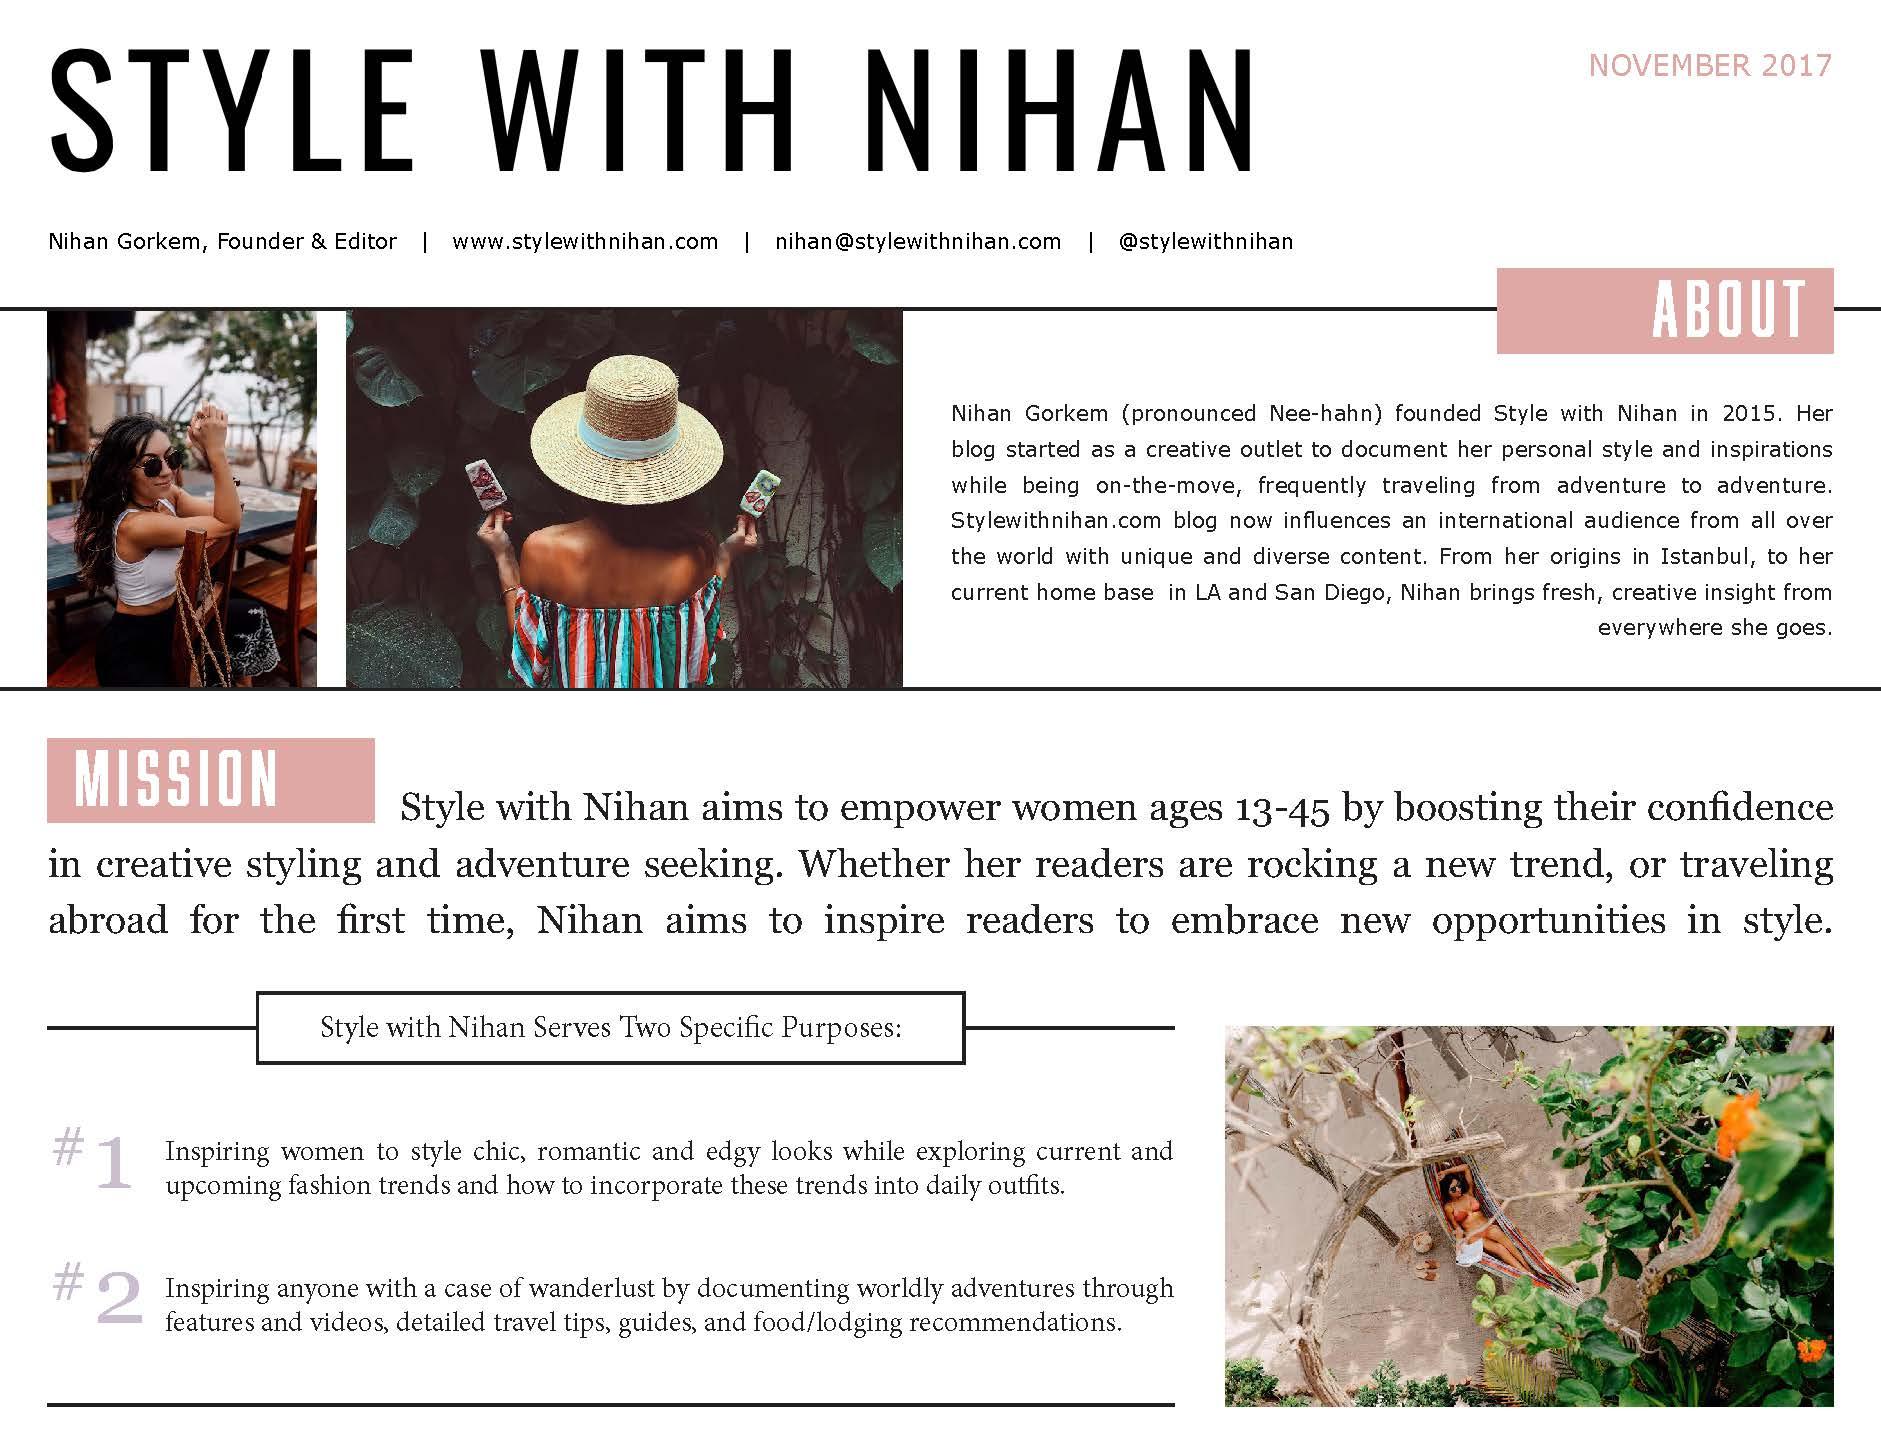 StyleWithNihan-MediaKit-11-17_Page_1.jpg